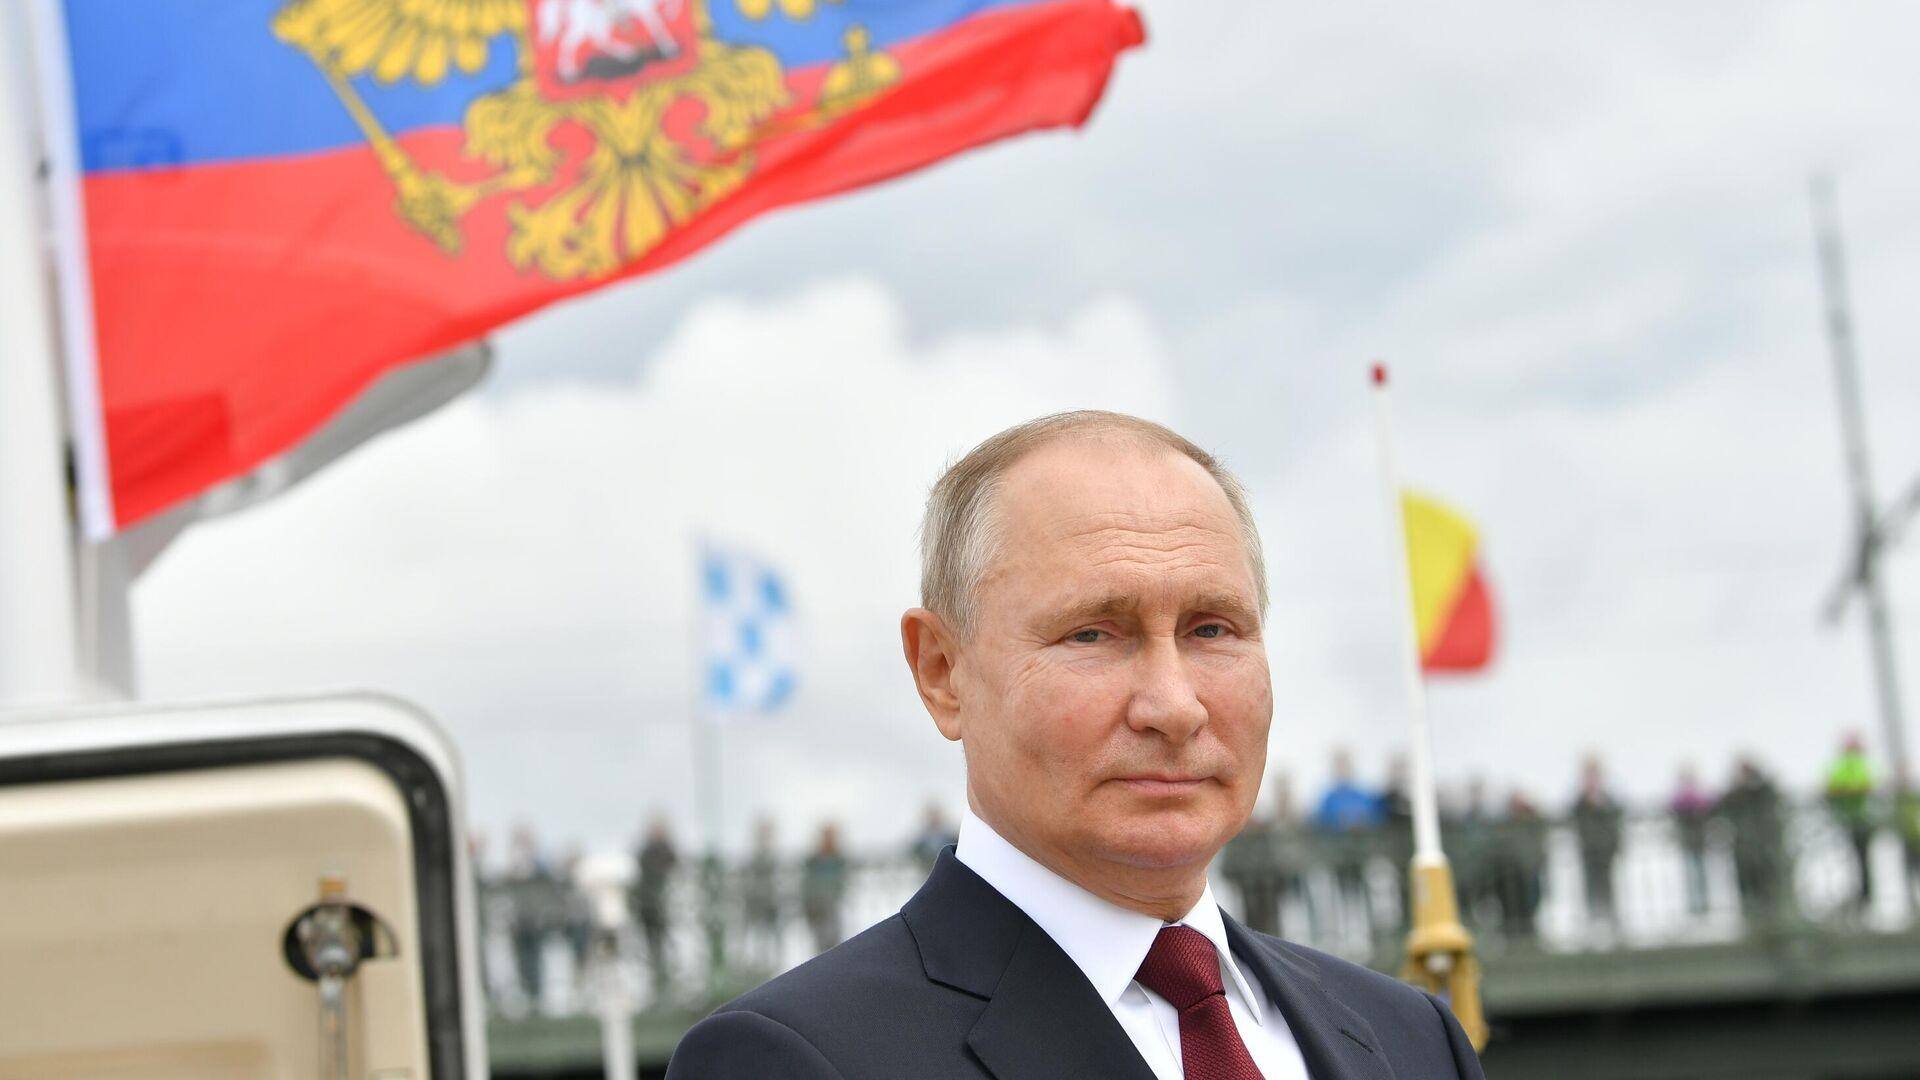 Vladimir Putin alla parata navale dedicata alla giornata della flotta russa - Sputnik Italia, 1920, 25.07.2021